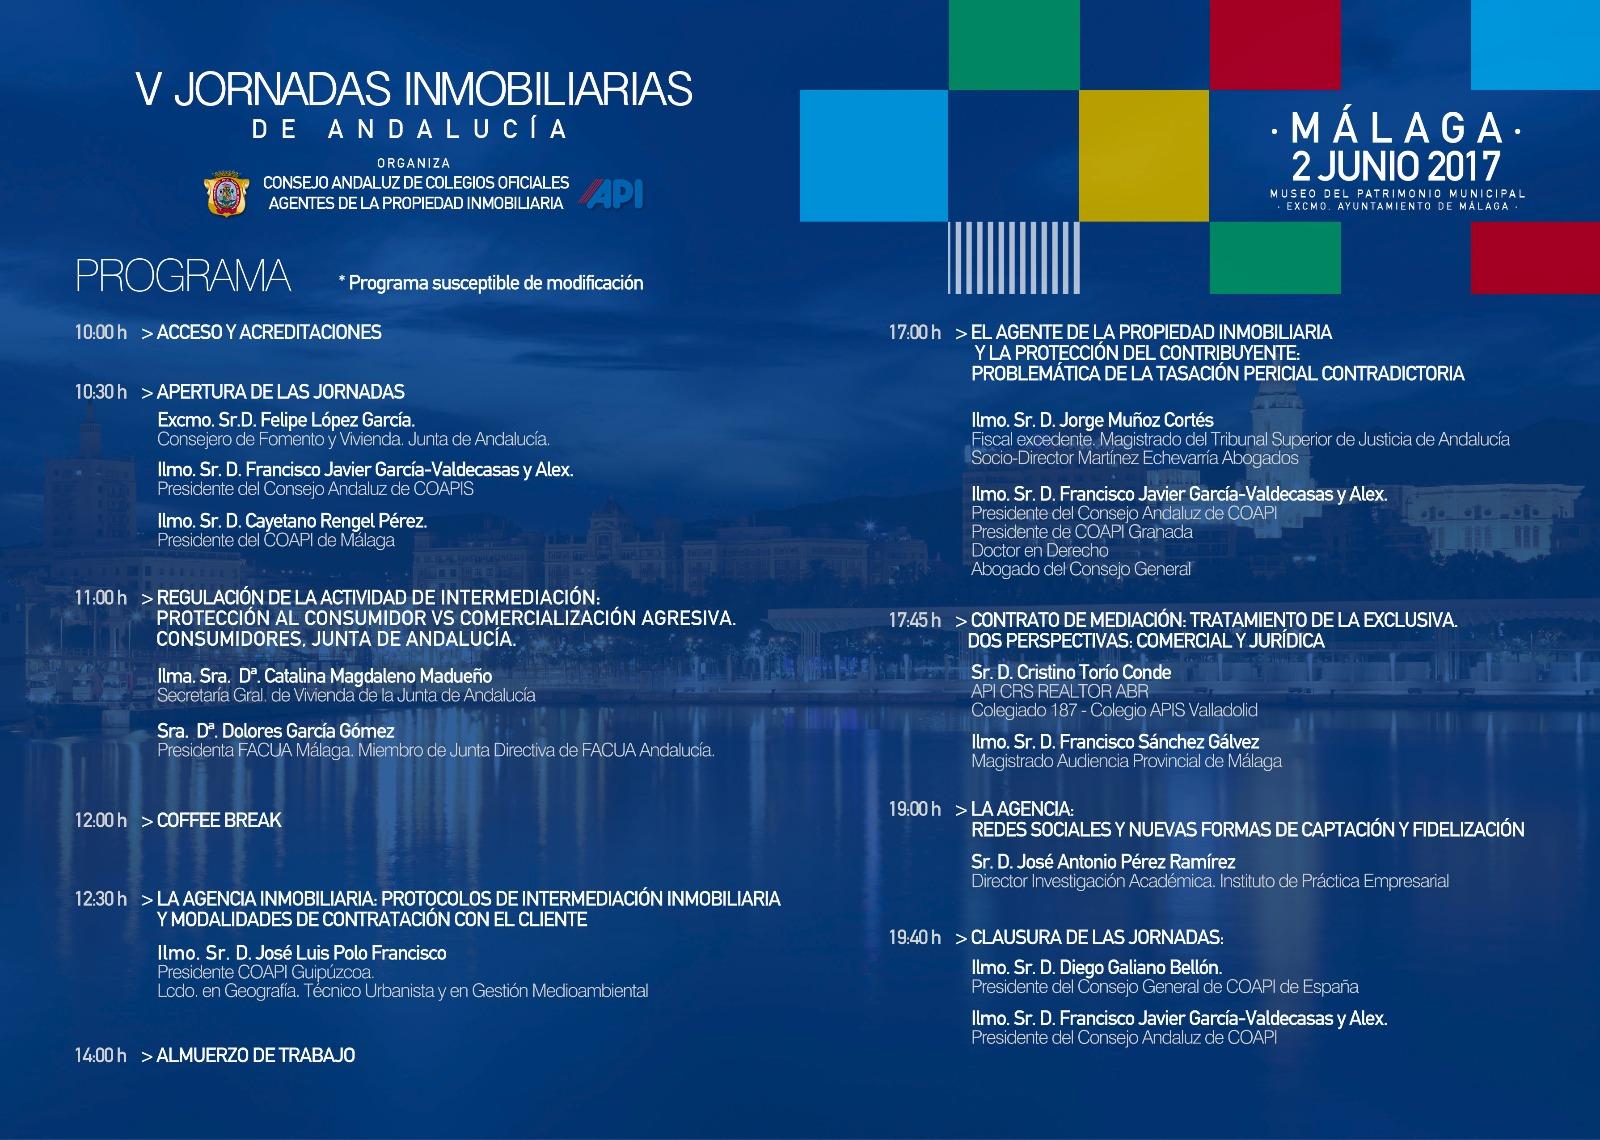 PROGRAMA V JORNADAS INMOBILIARIAS DE ANDALUCIA MALAGA